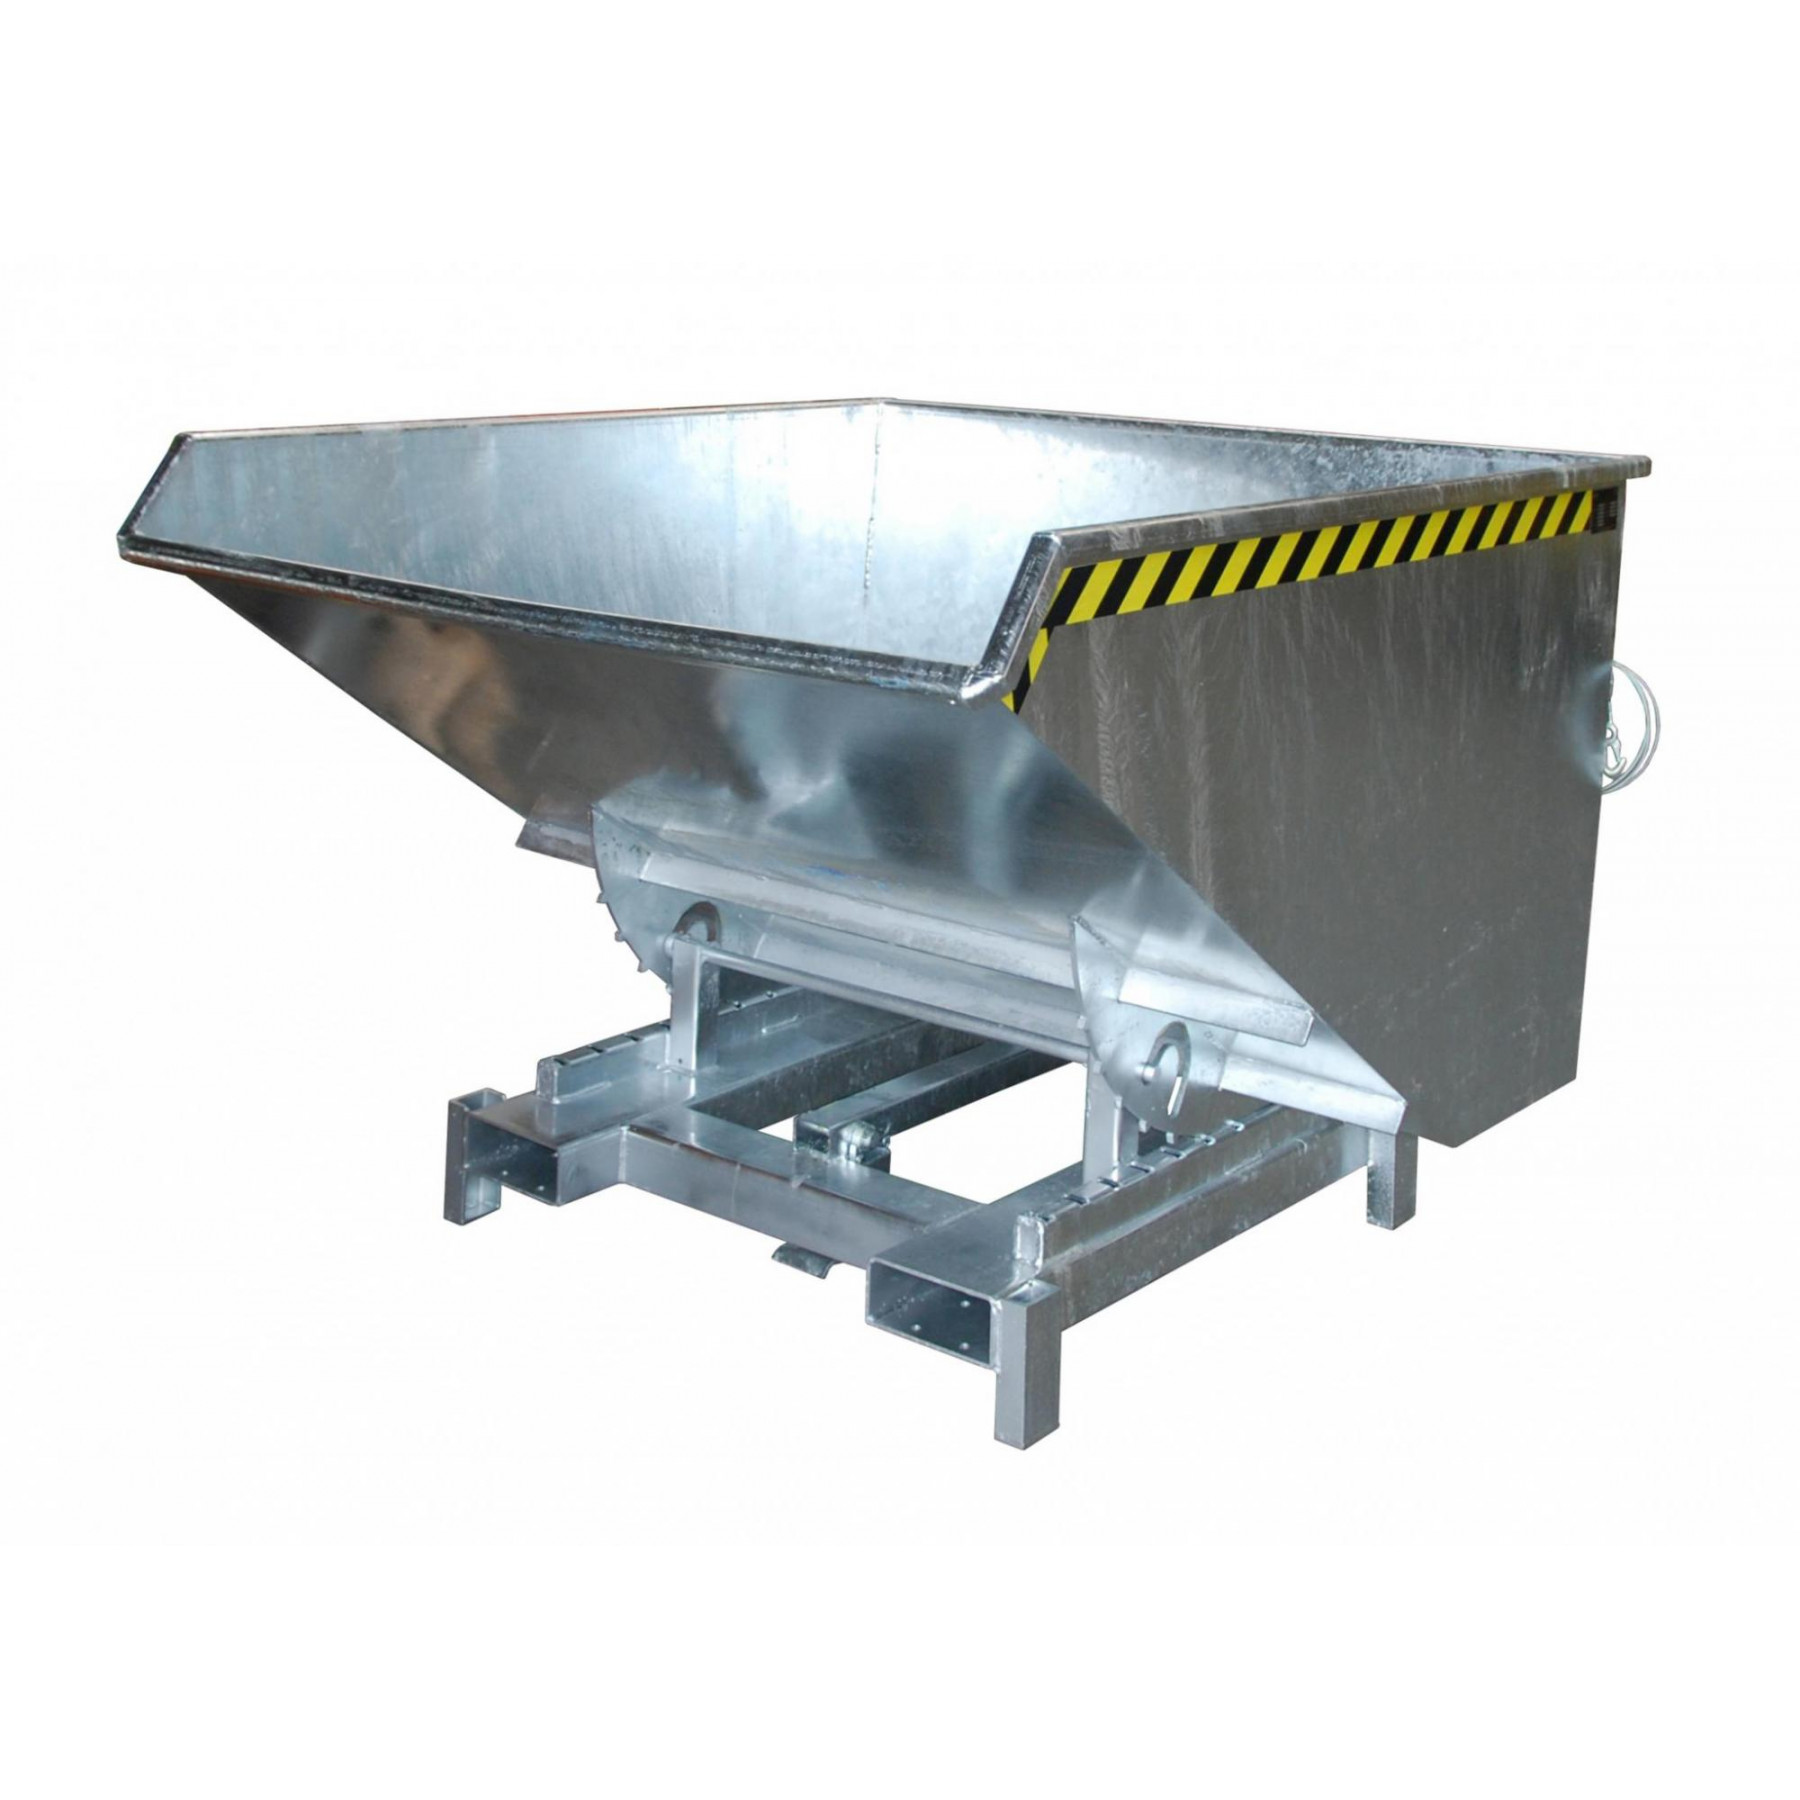 Kiepcontainer extra zwaar 1700 liter, MTF-SK-1700-V